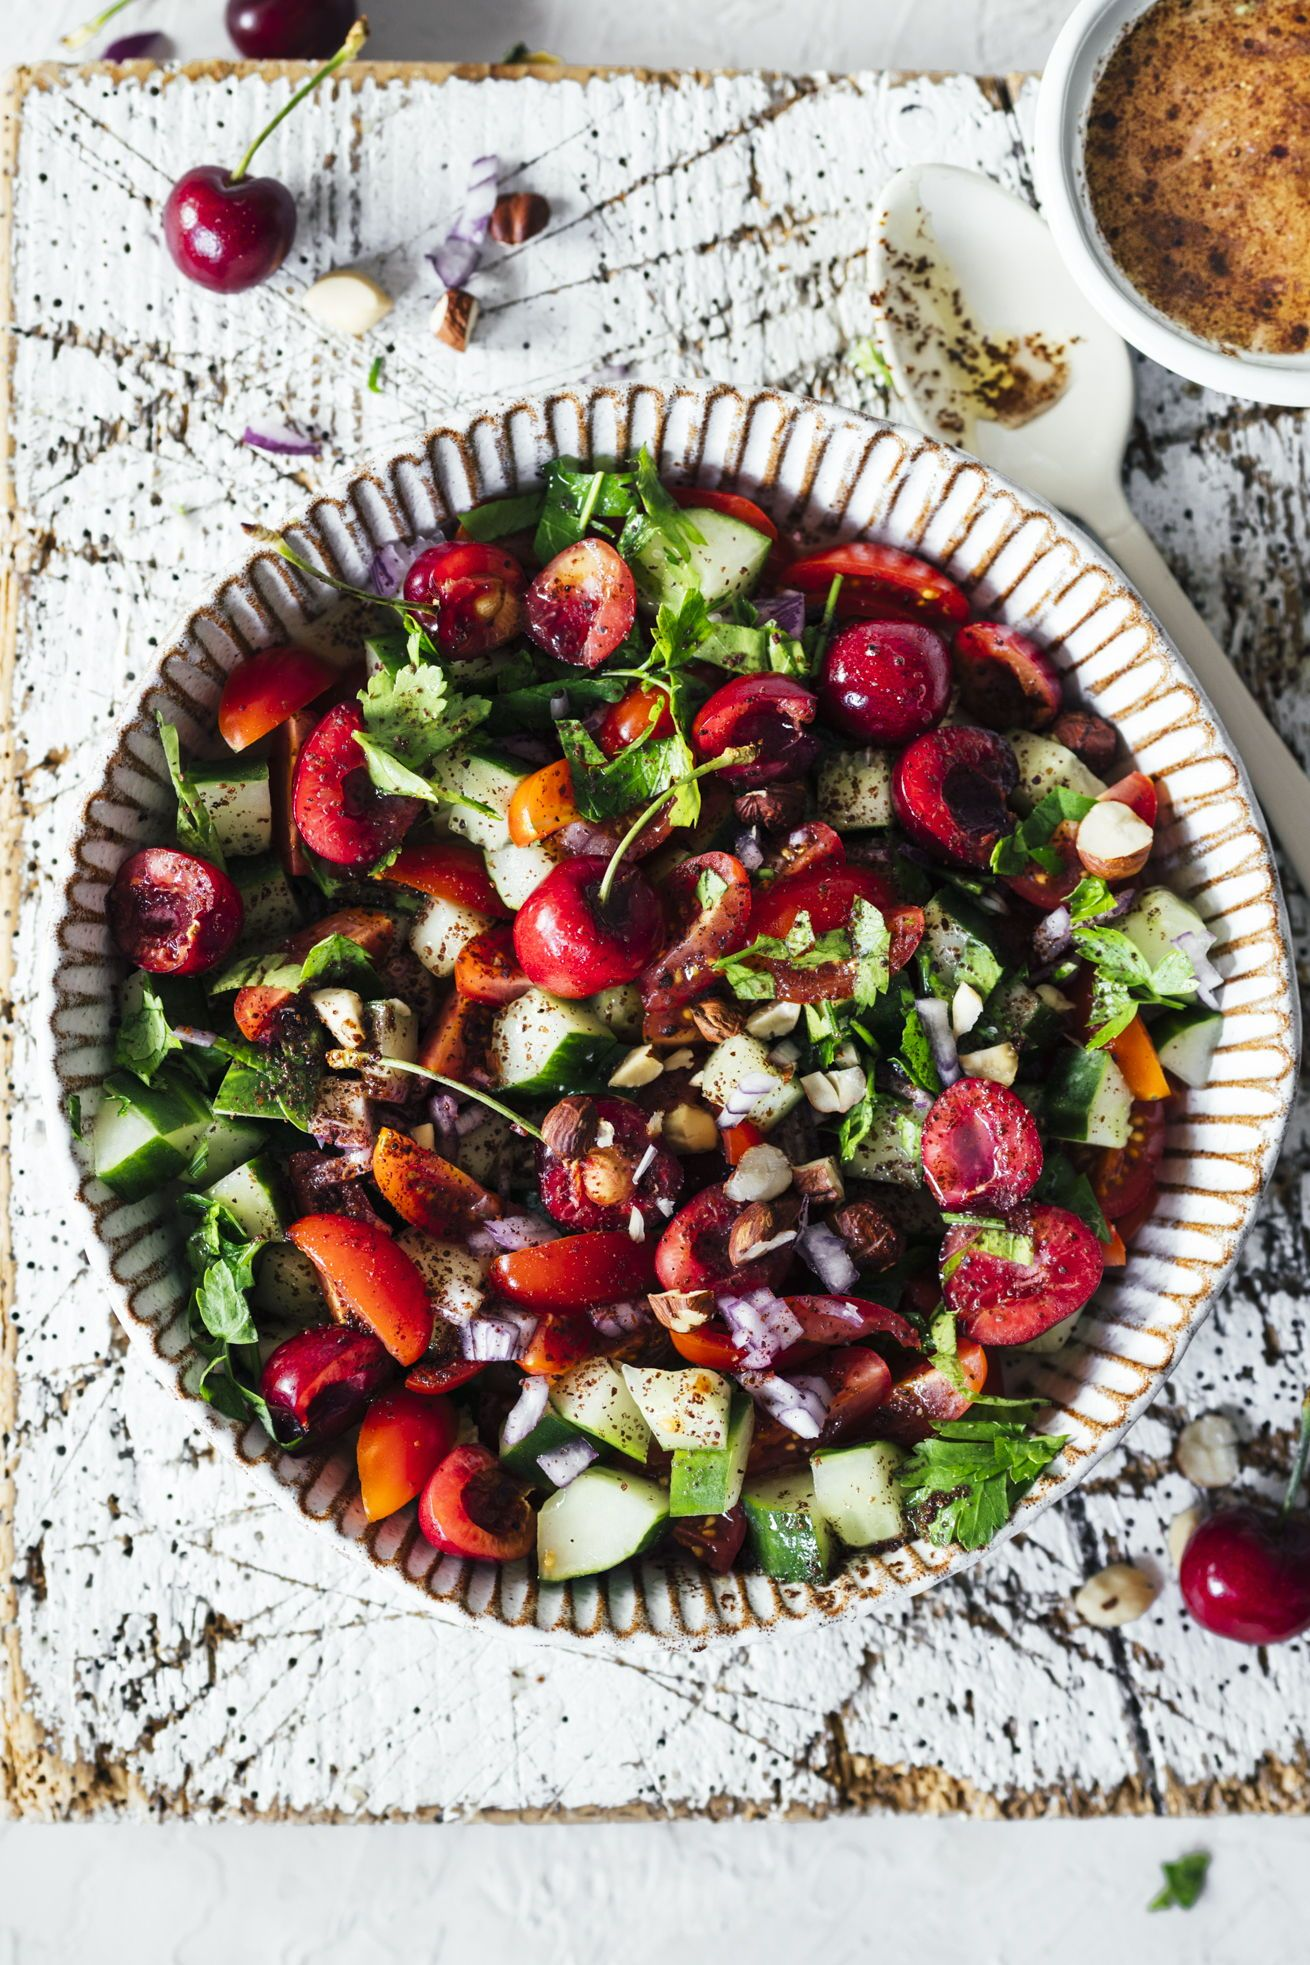 0db89581e1fdca9f06e627a1a7ac54b3 - Rezepte Salat